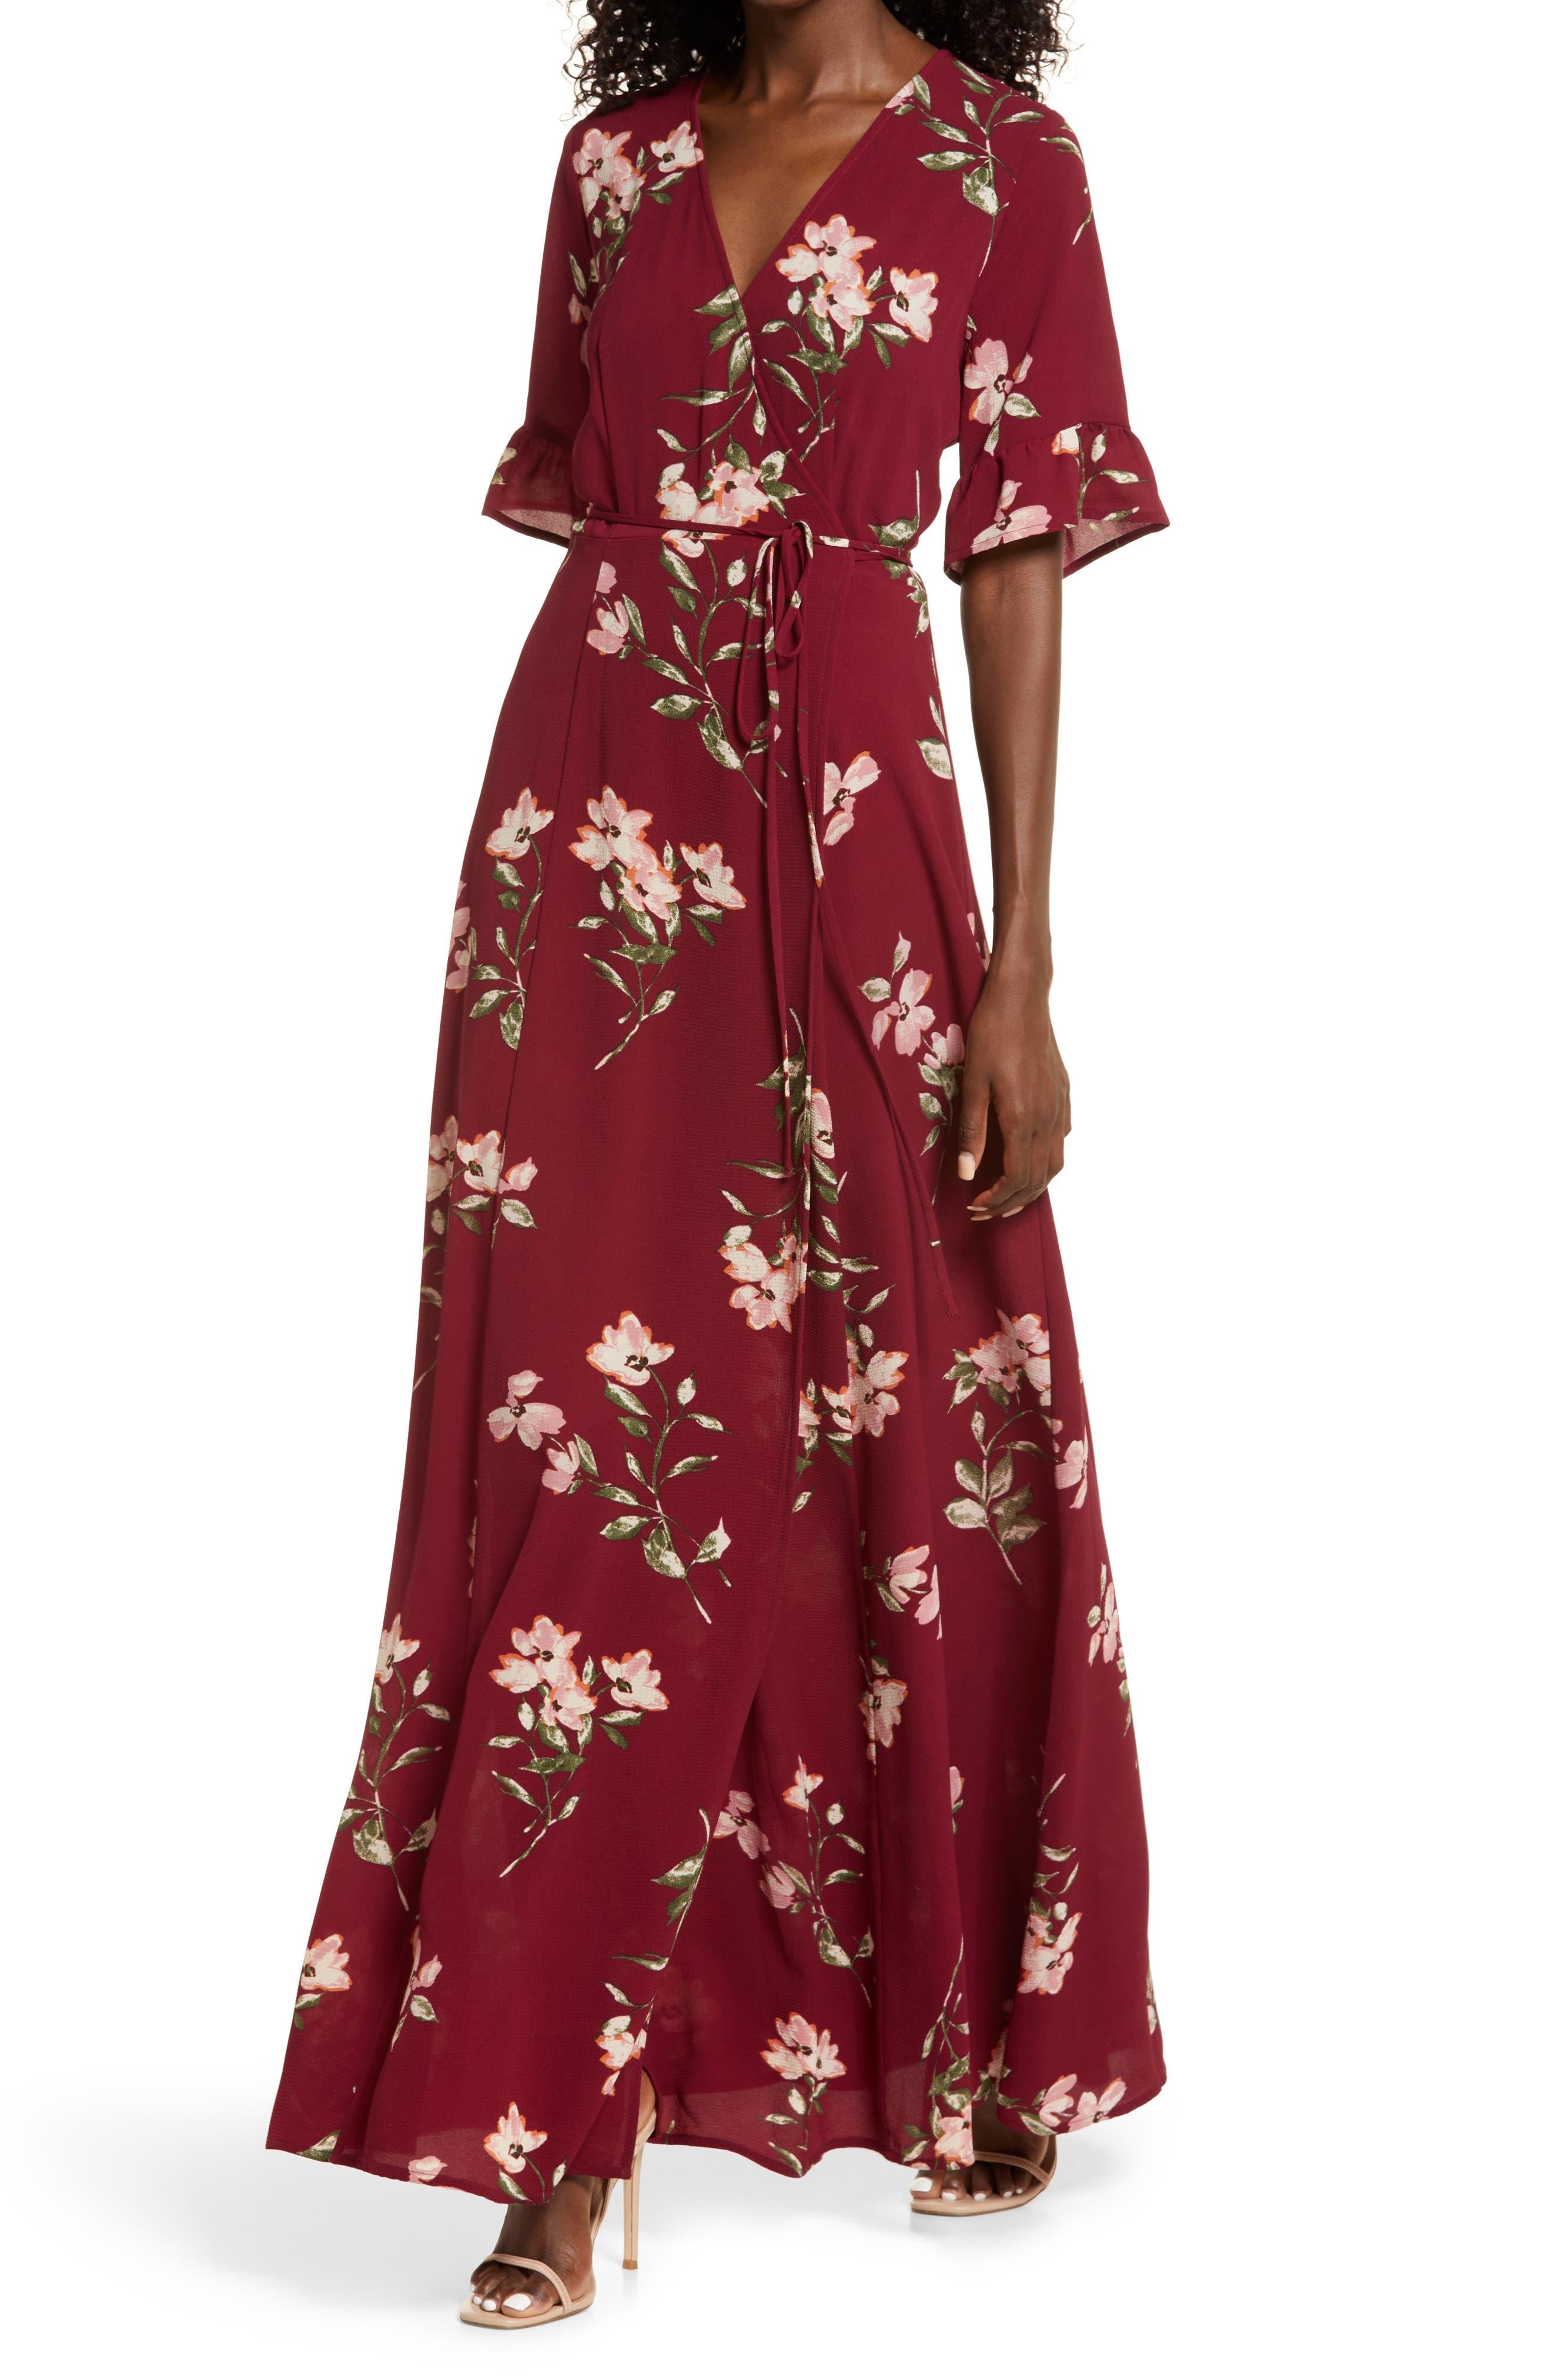 September Sunset Floral Print Dress